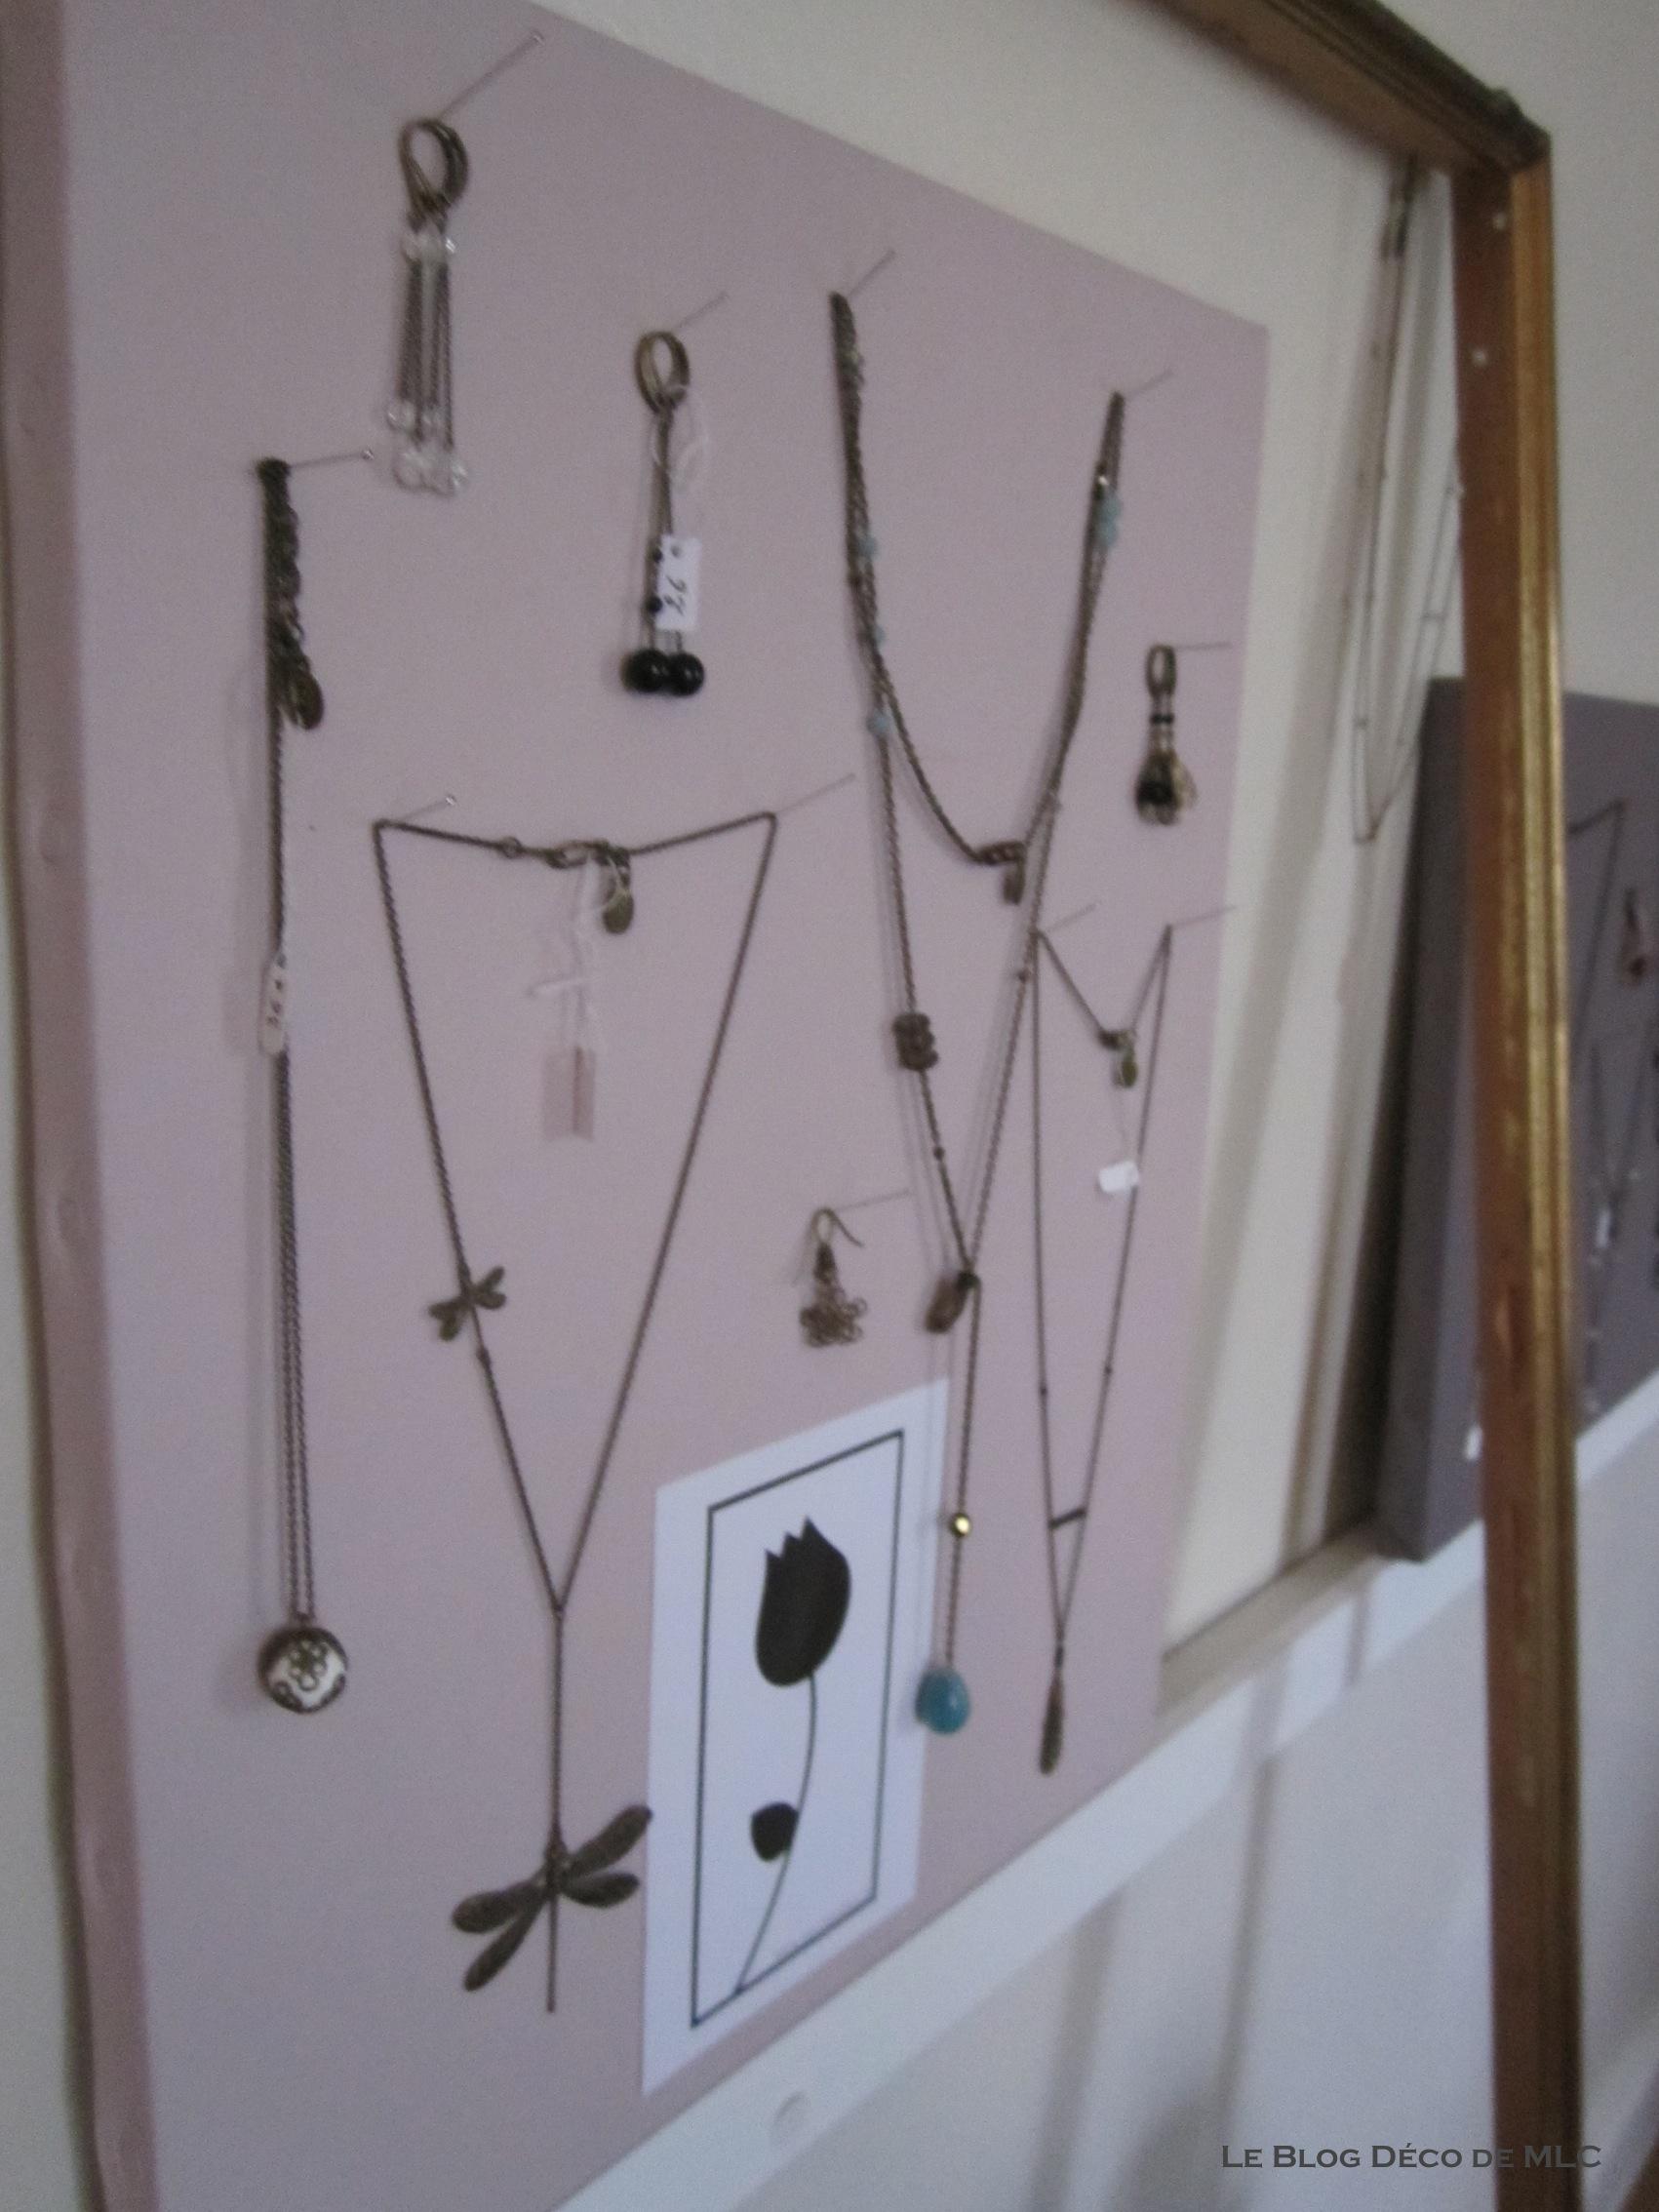 5 id es d co de porte bijoux arbre bijoux pr sentoir. Black Bedroom Furniture Sets. Home Design Ideas